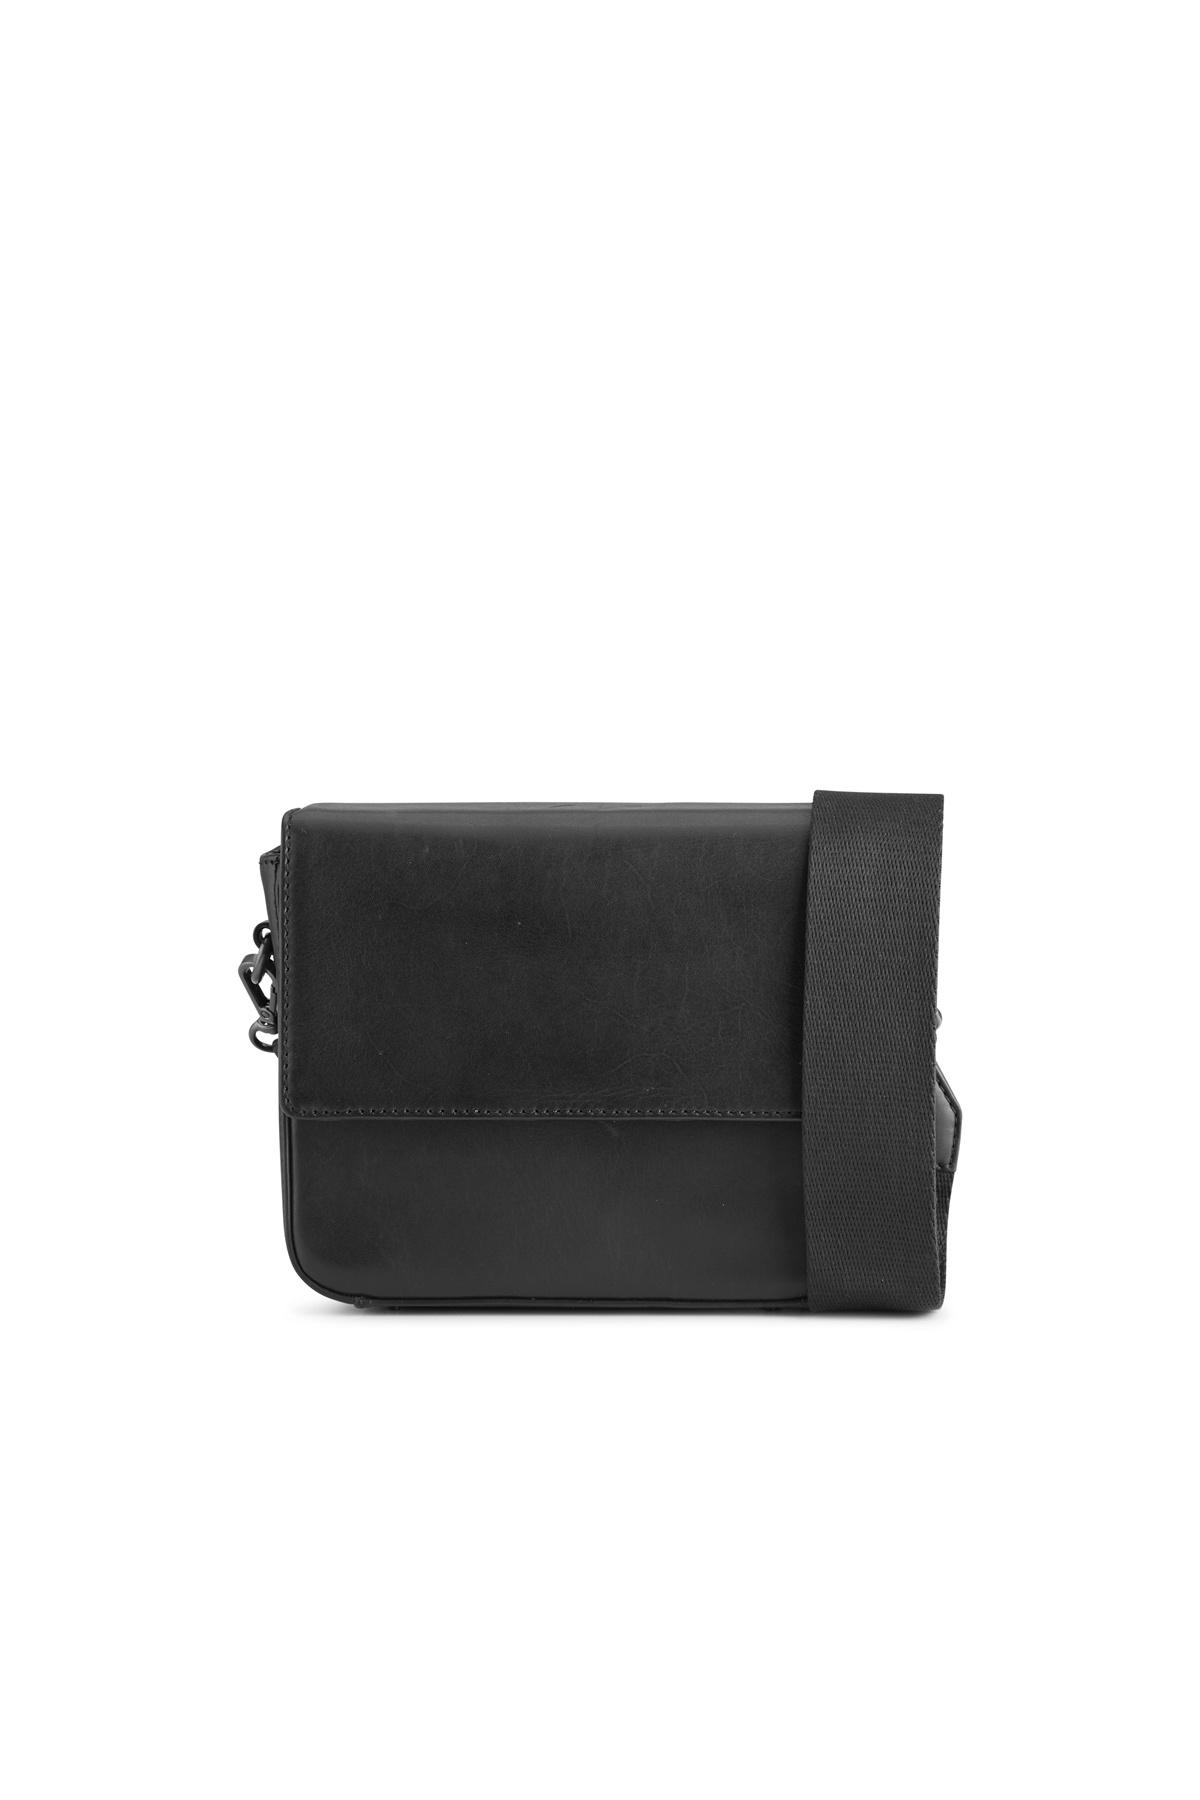 Adora Large Crossbody Bag - Antique Black w/ Black-5